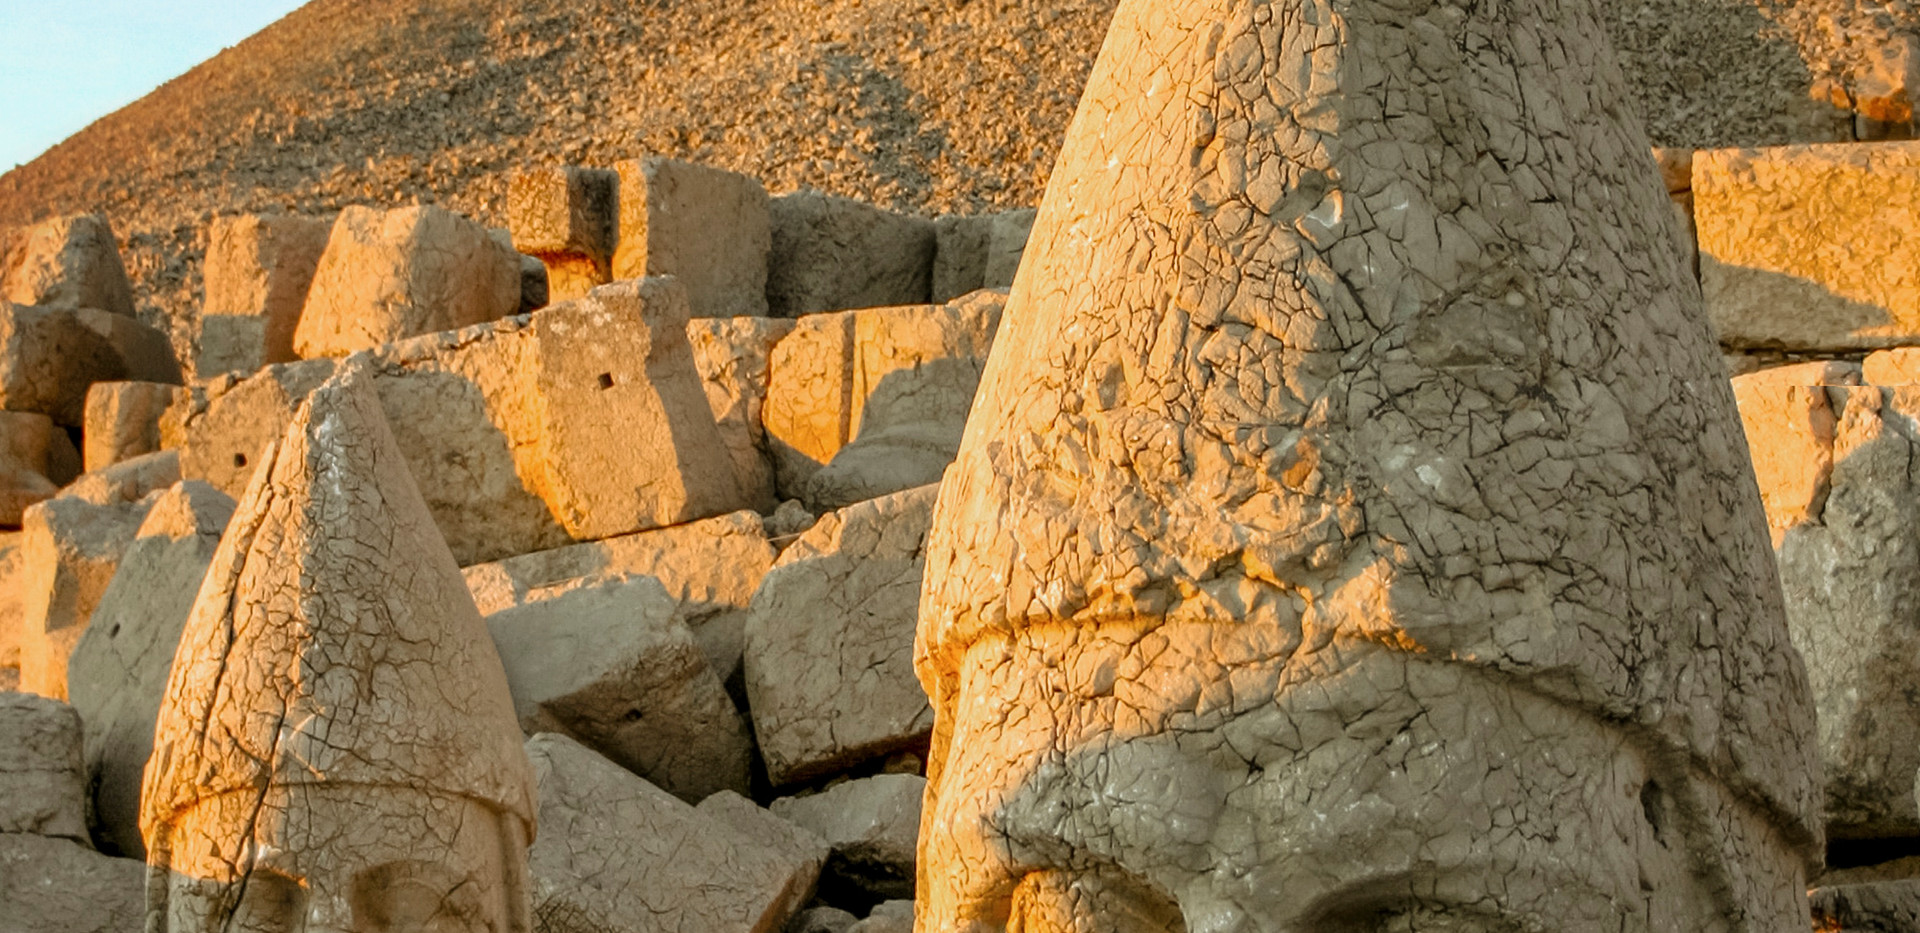 MOUNT NEMRUT / ADIYAMAN